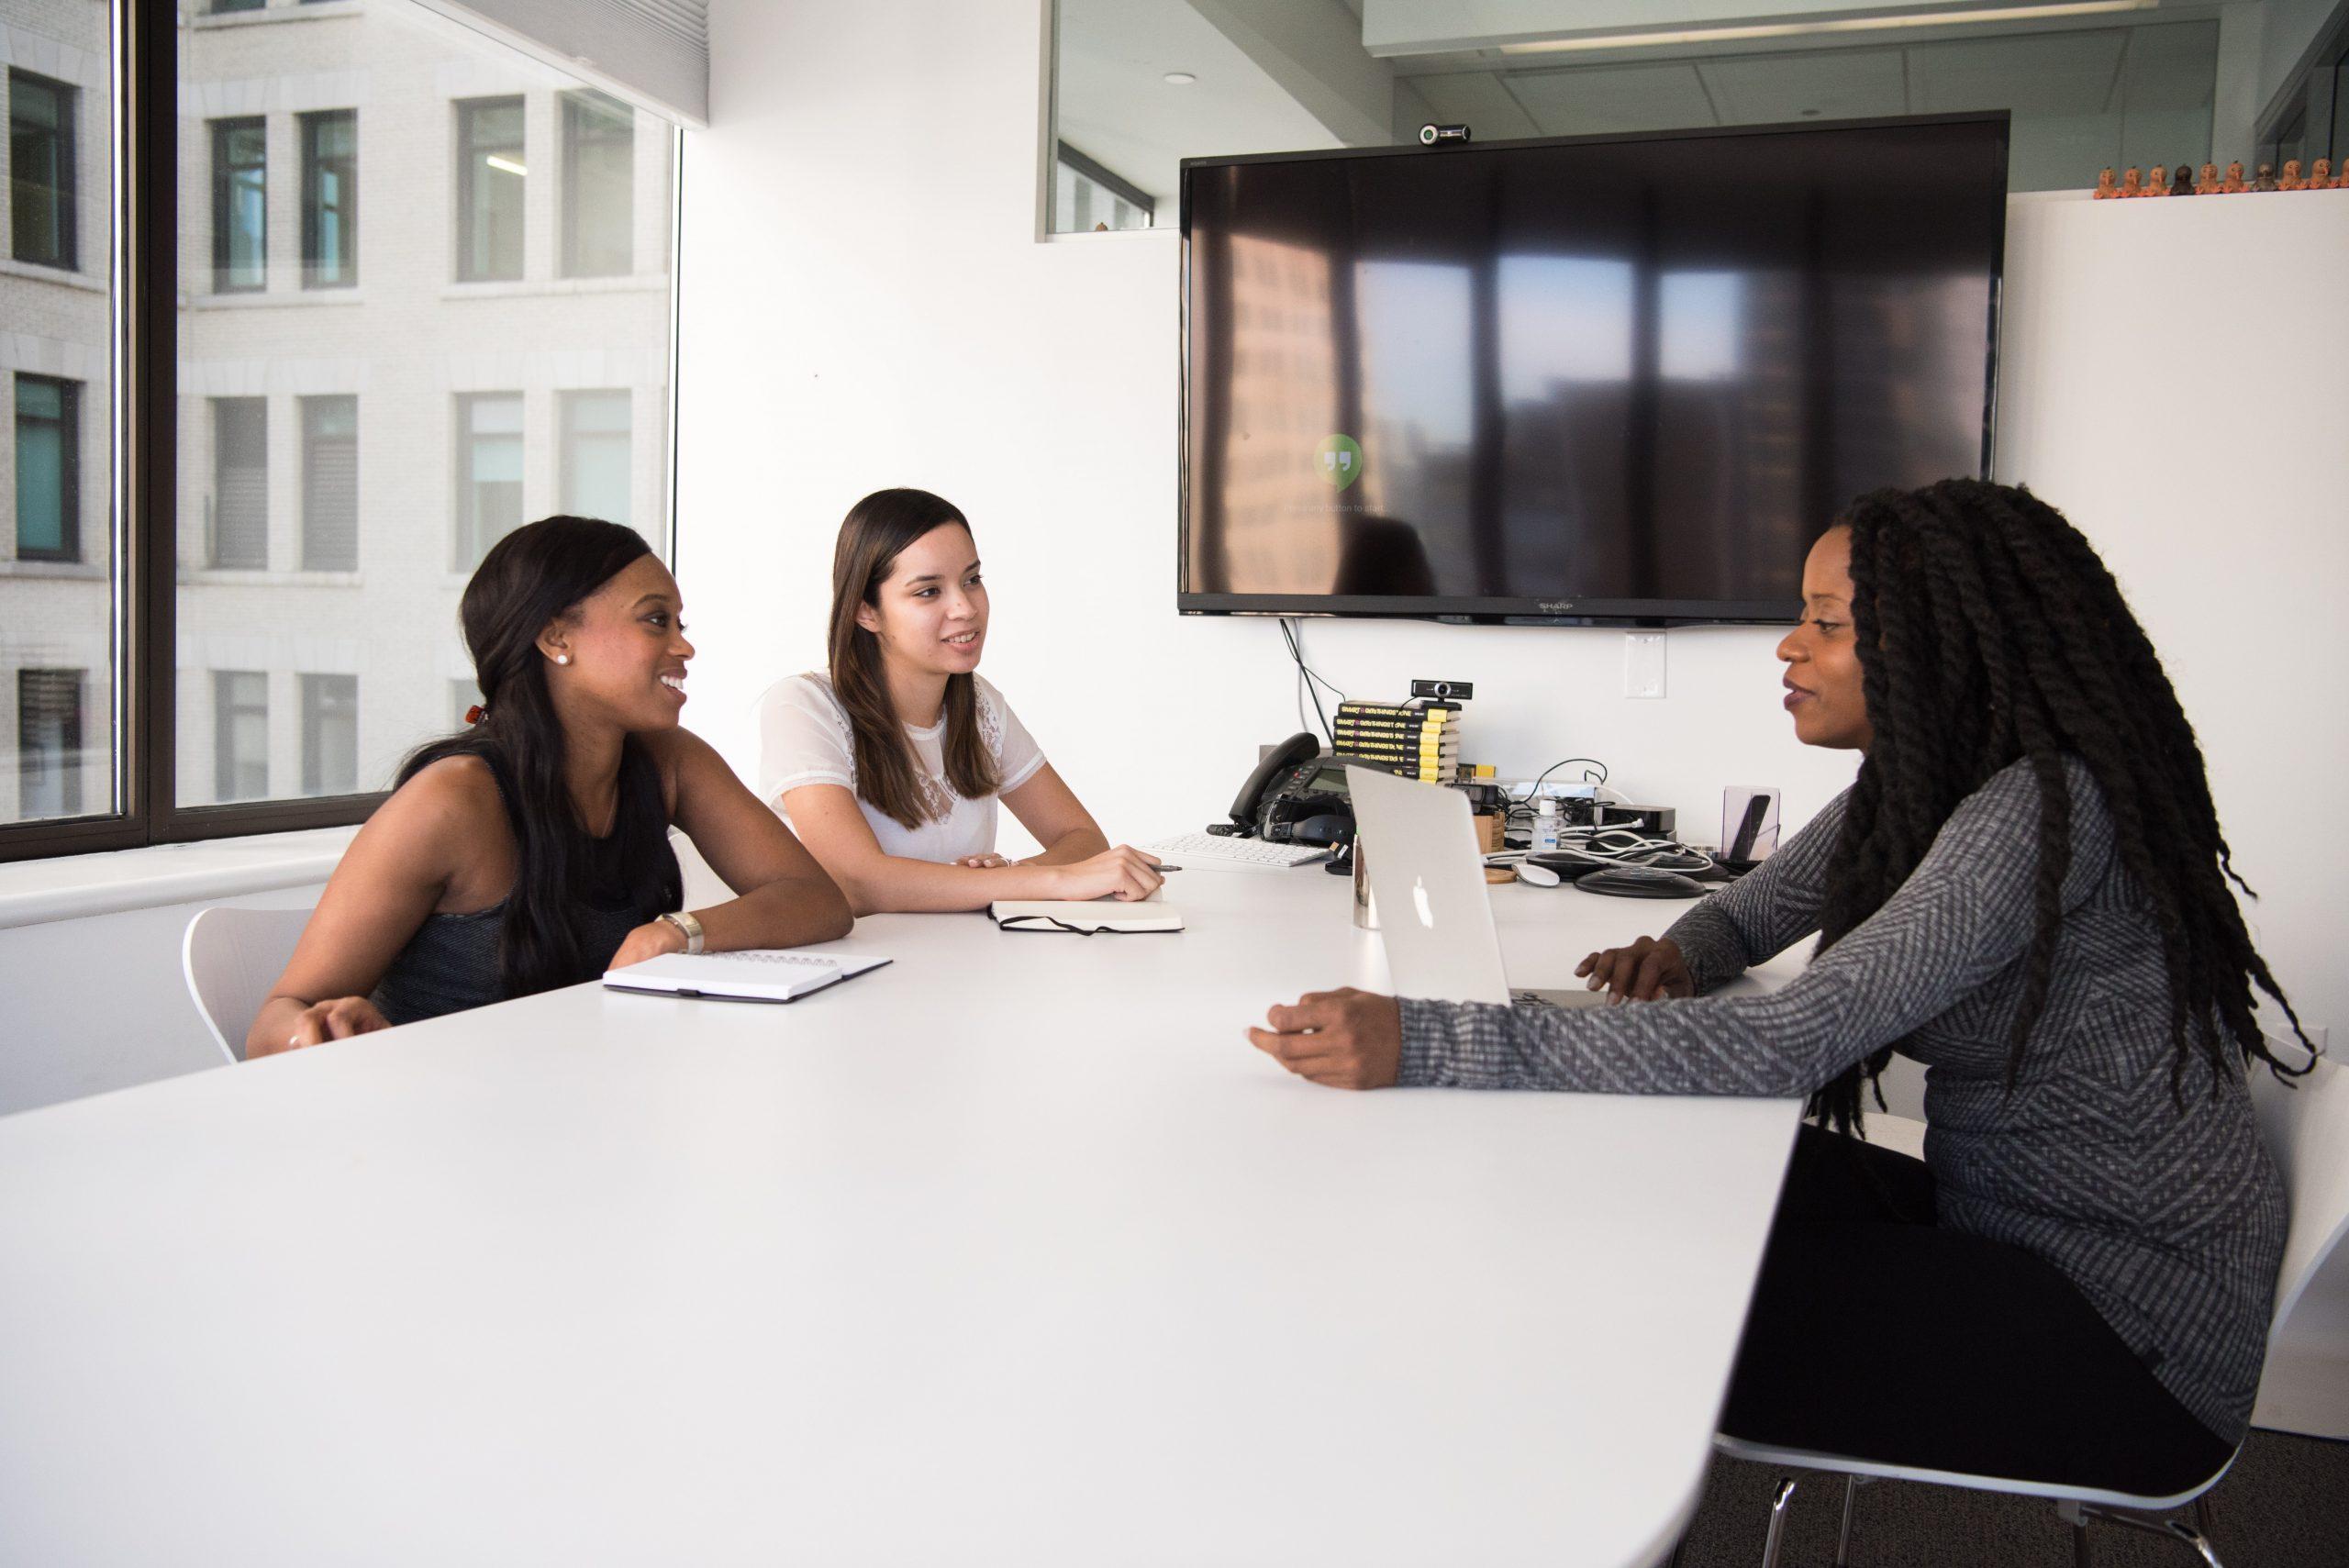 We're Hiring! HR Manager at Aspire4u CIC